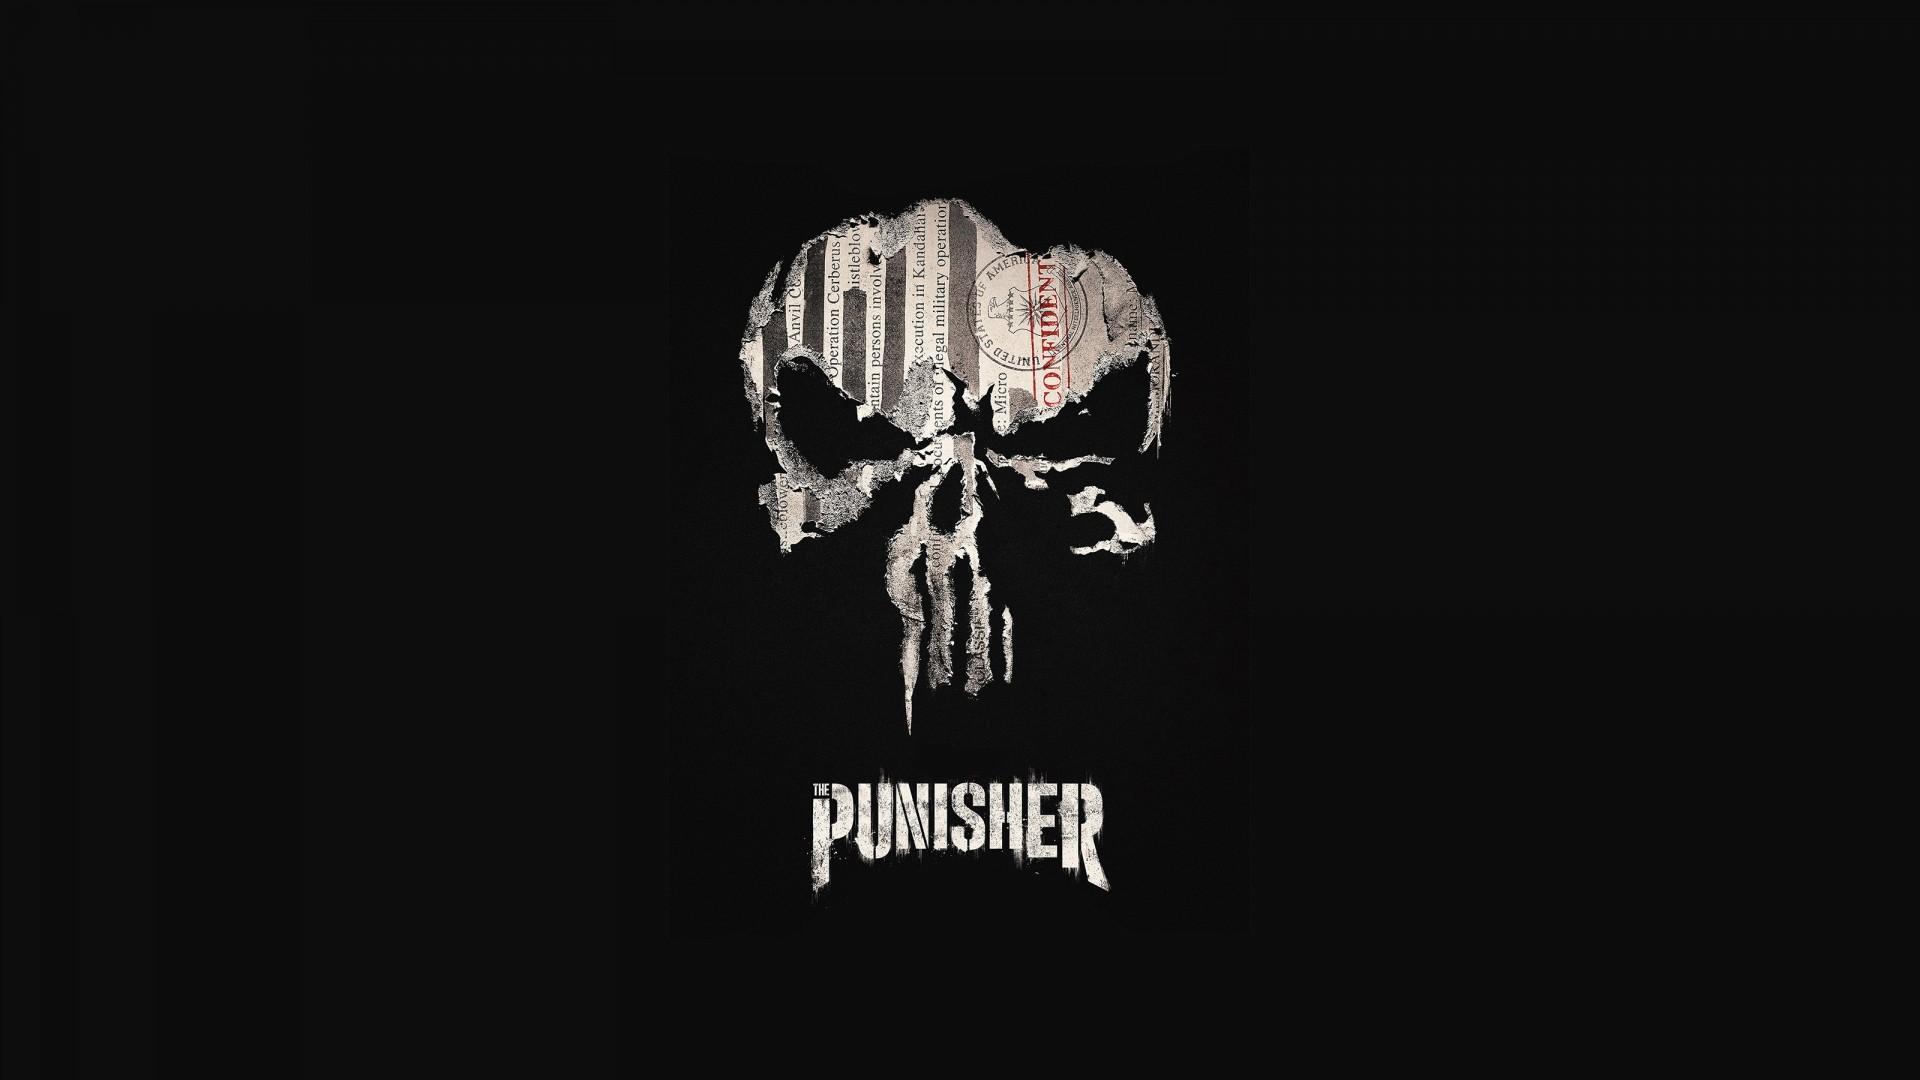 Movies / Punisher Wallpaper